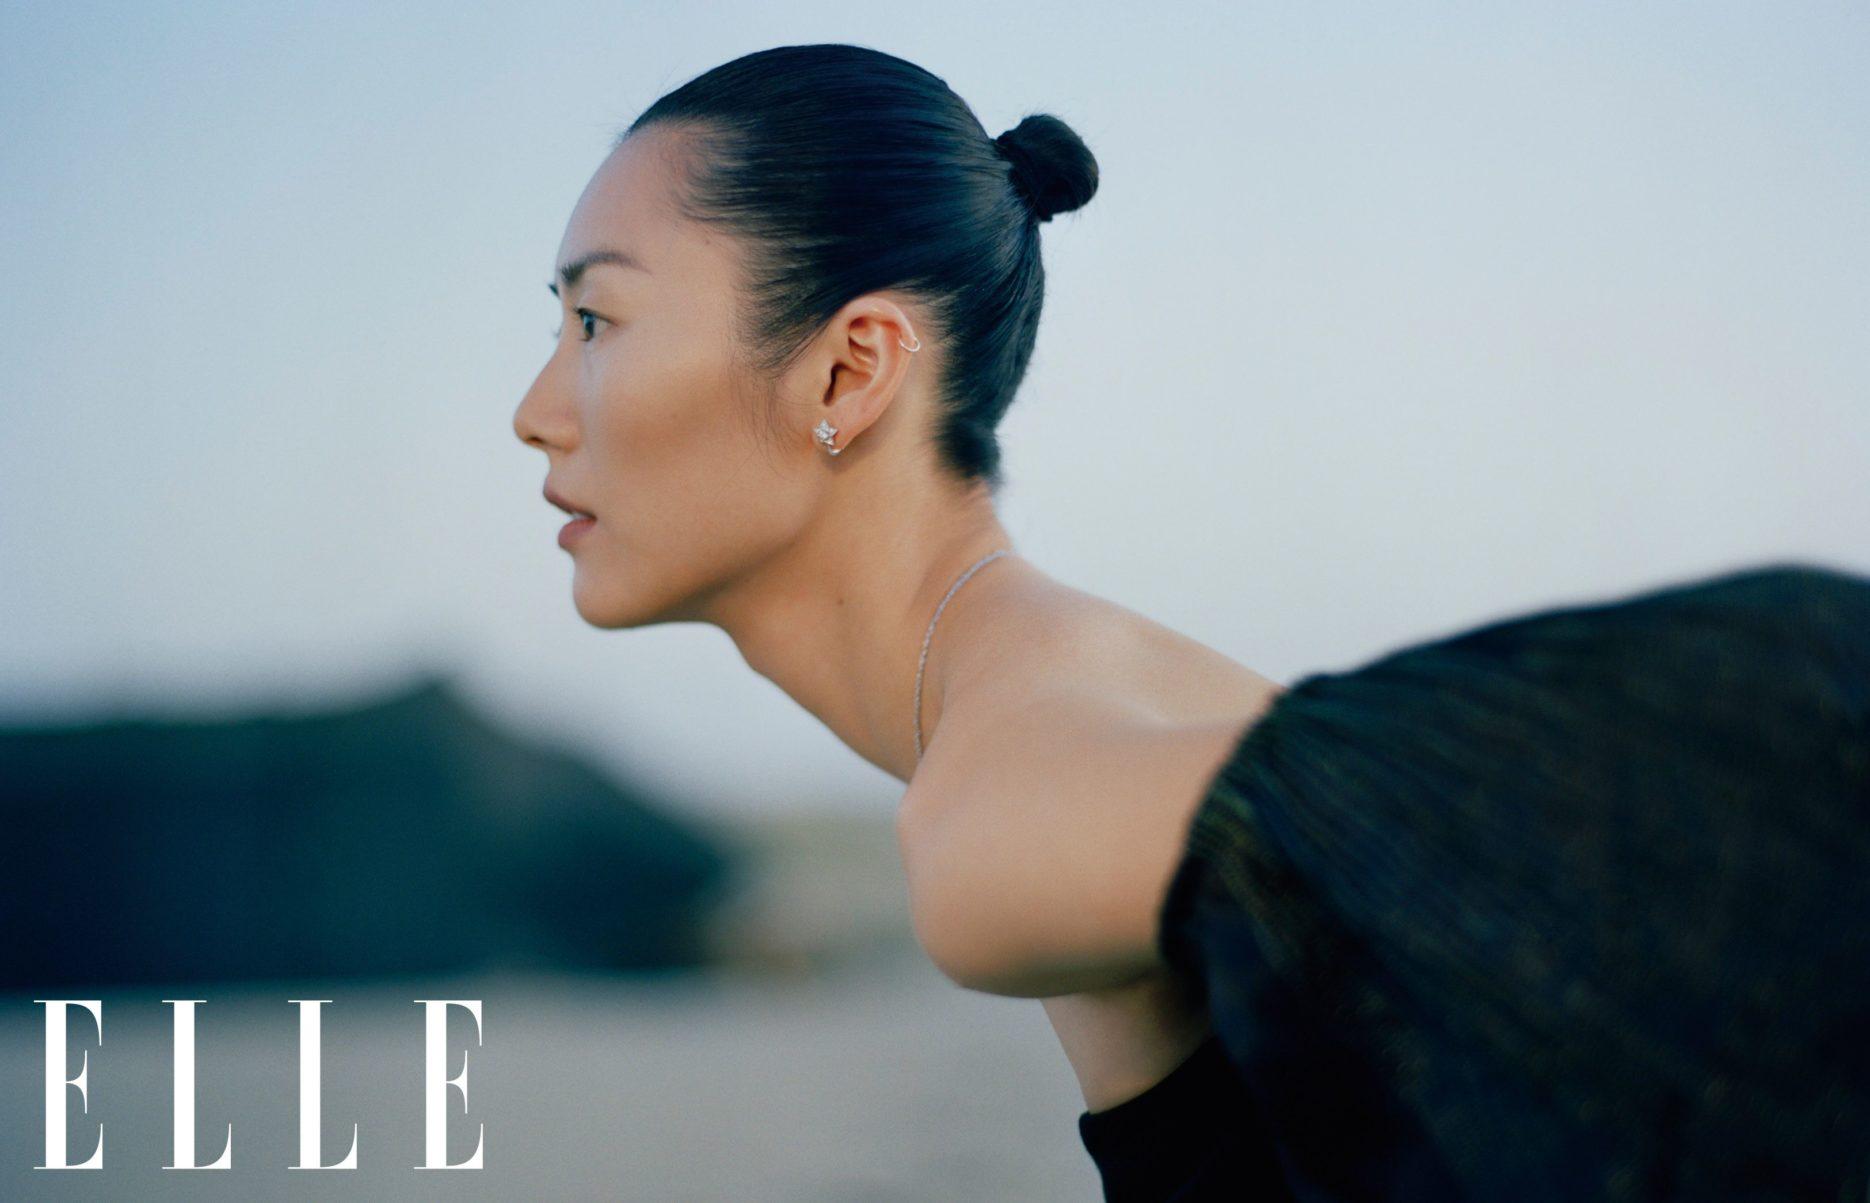 Supermodel Liu Wen. Credit: ELLE